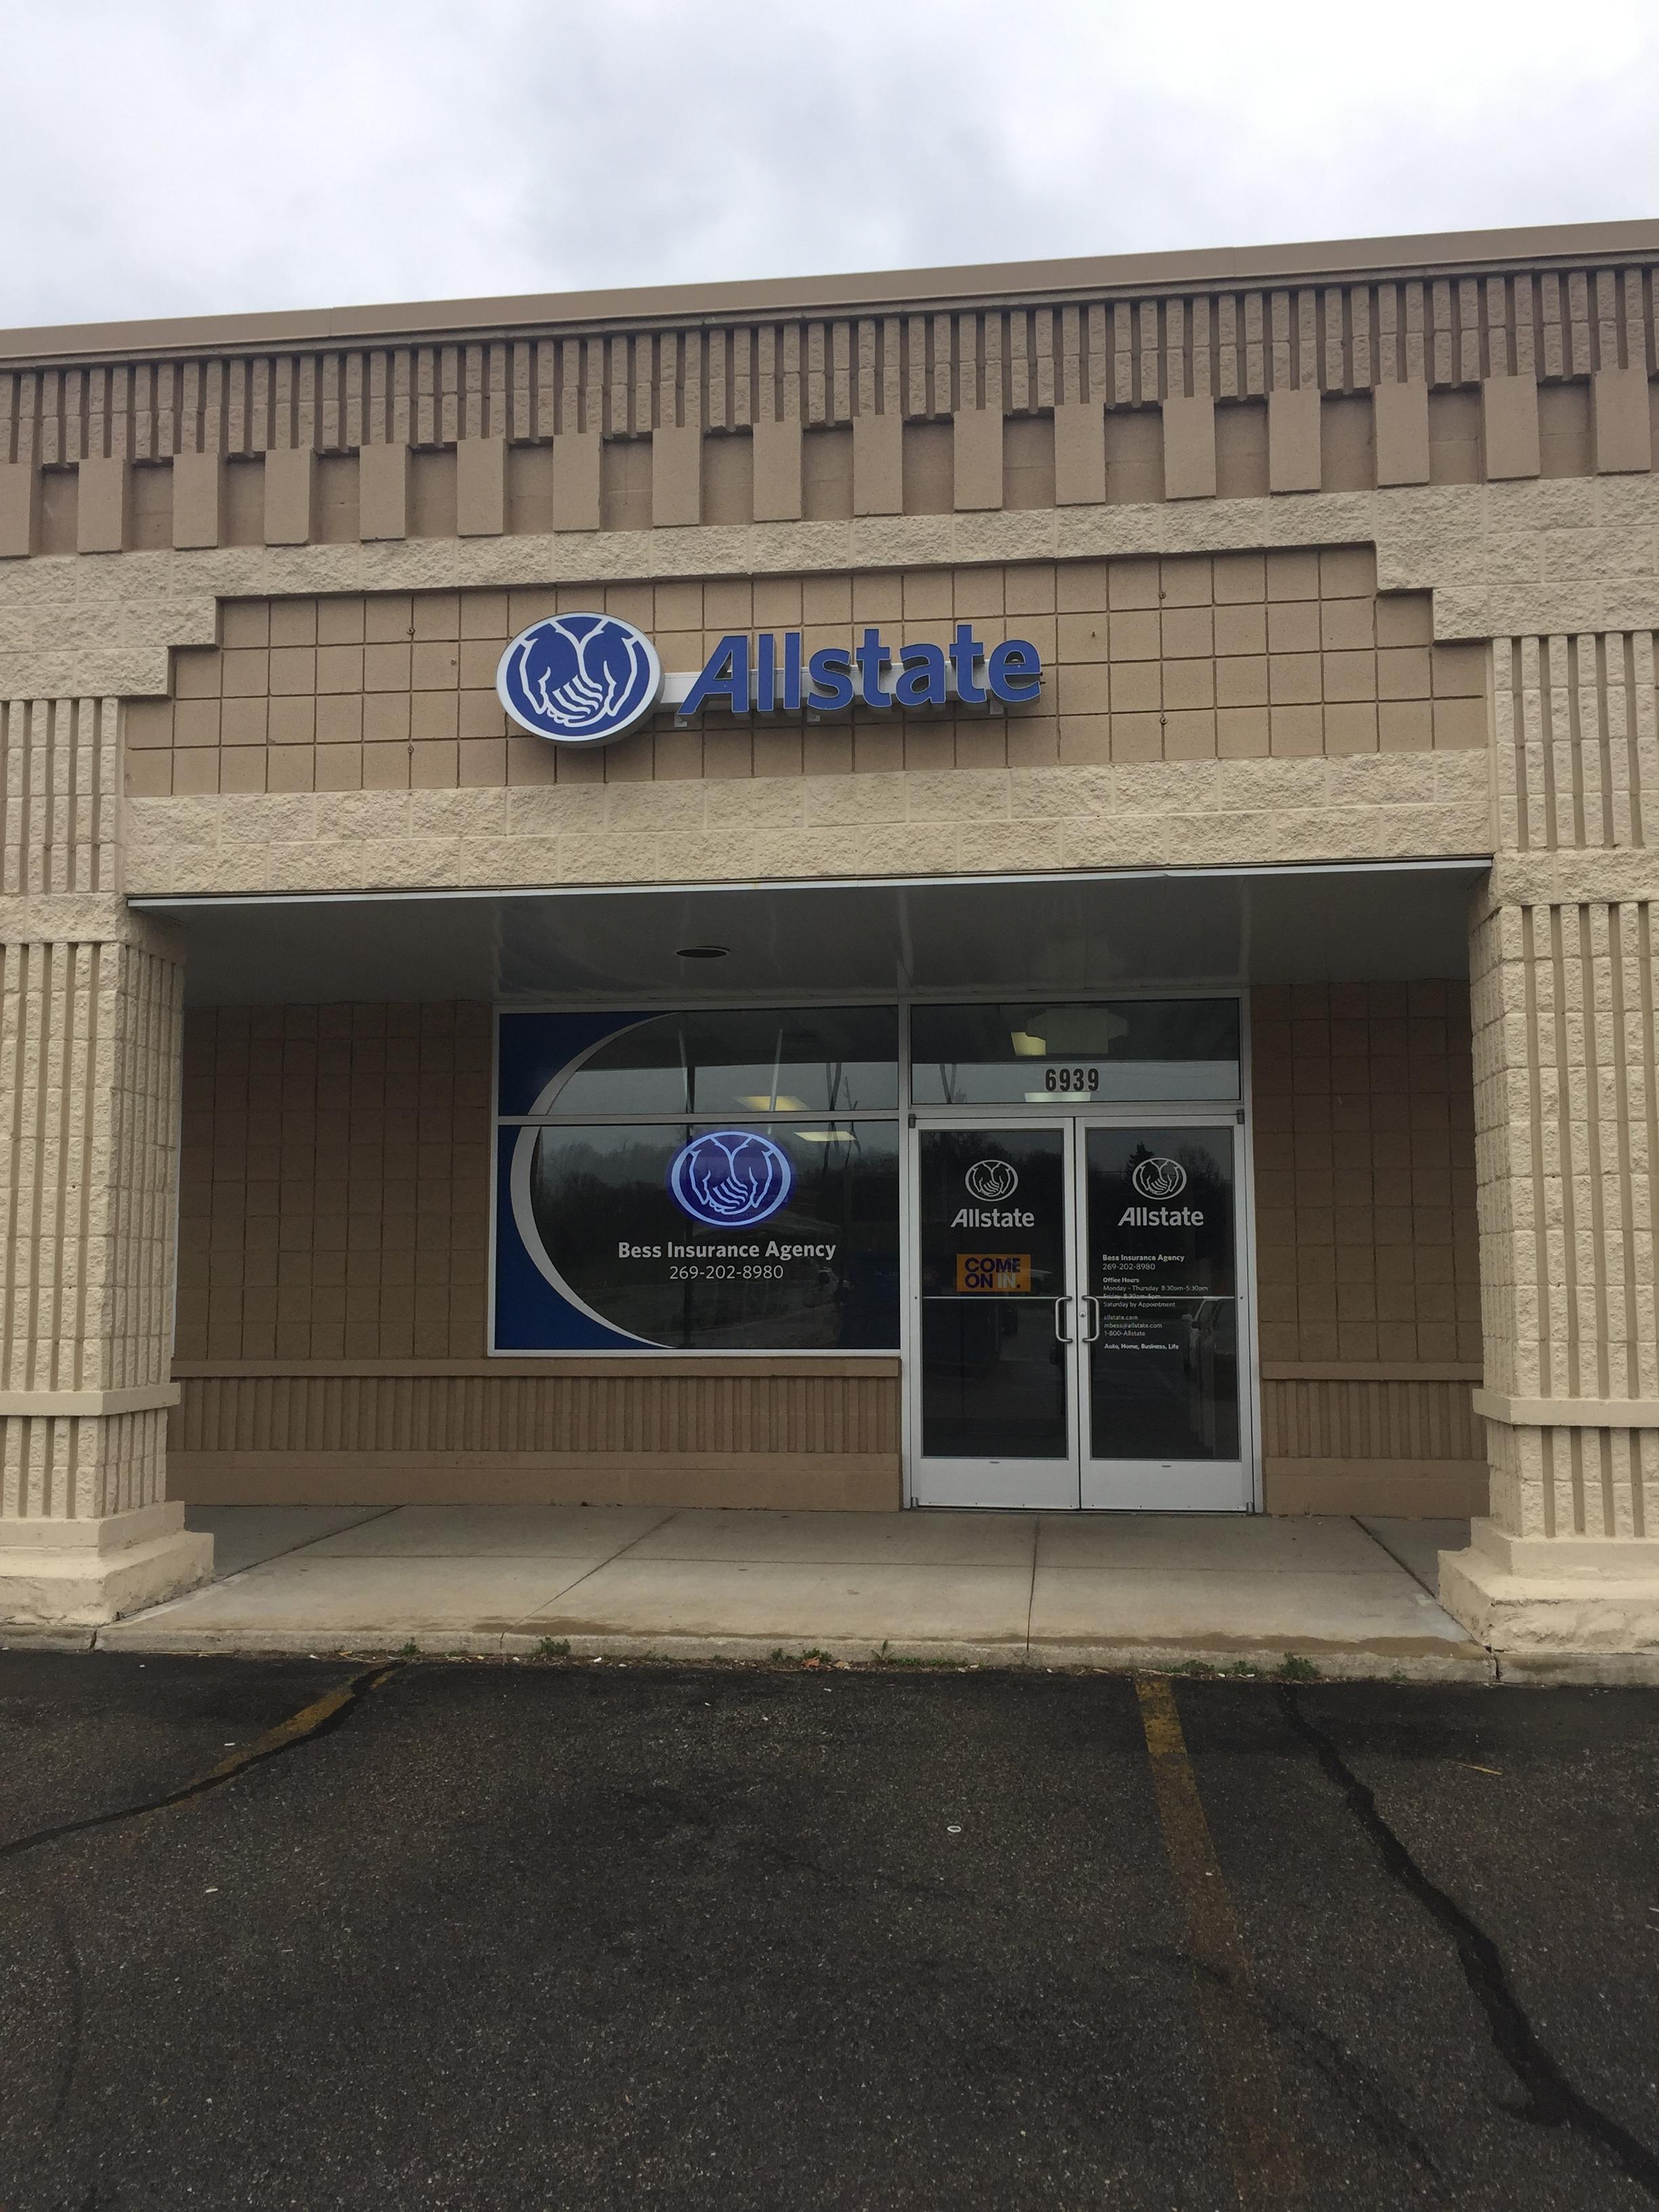 Allstate Insurance Agent: Michael Bess image 0